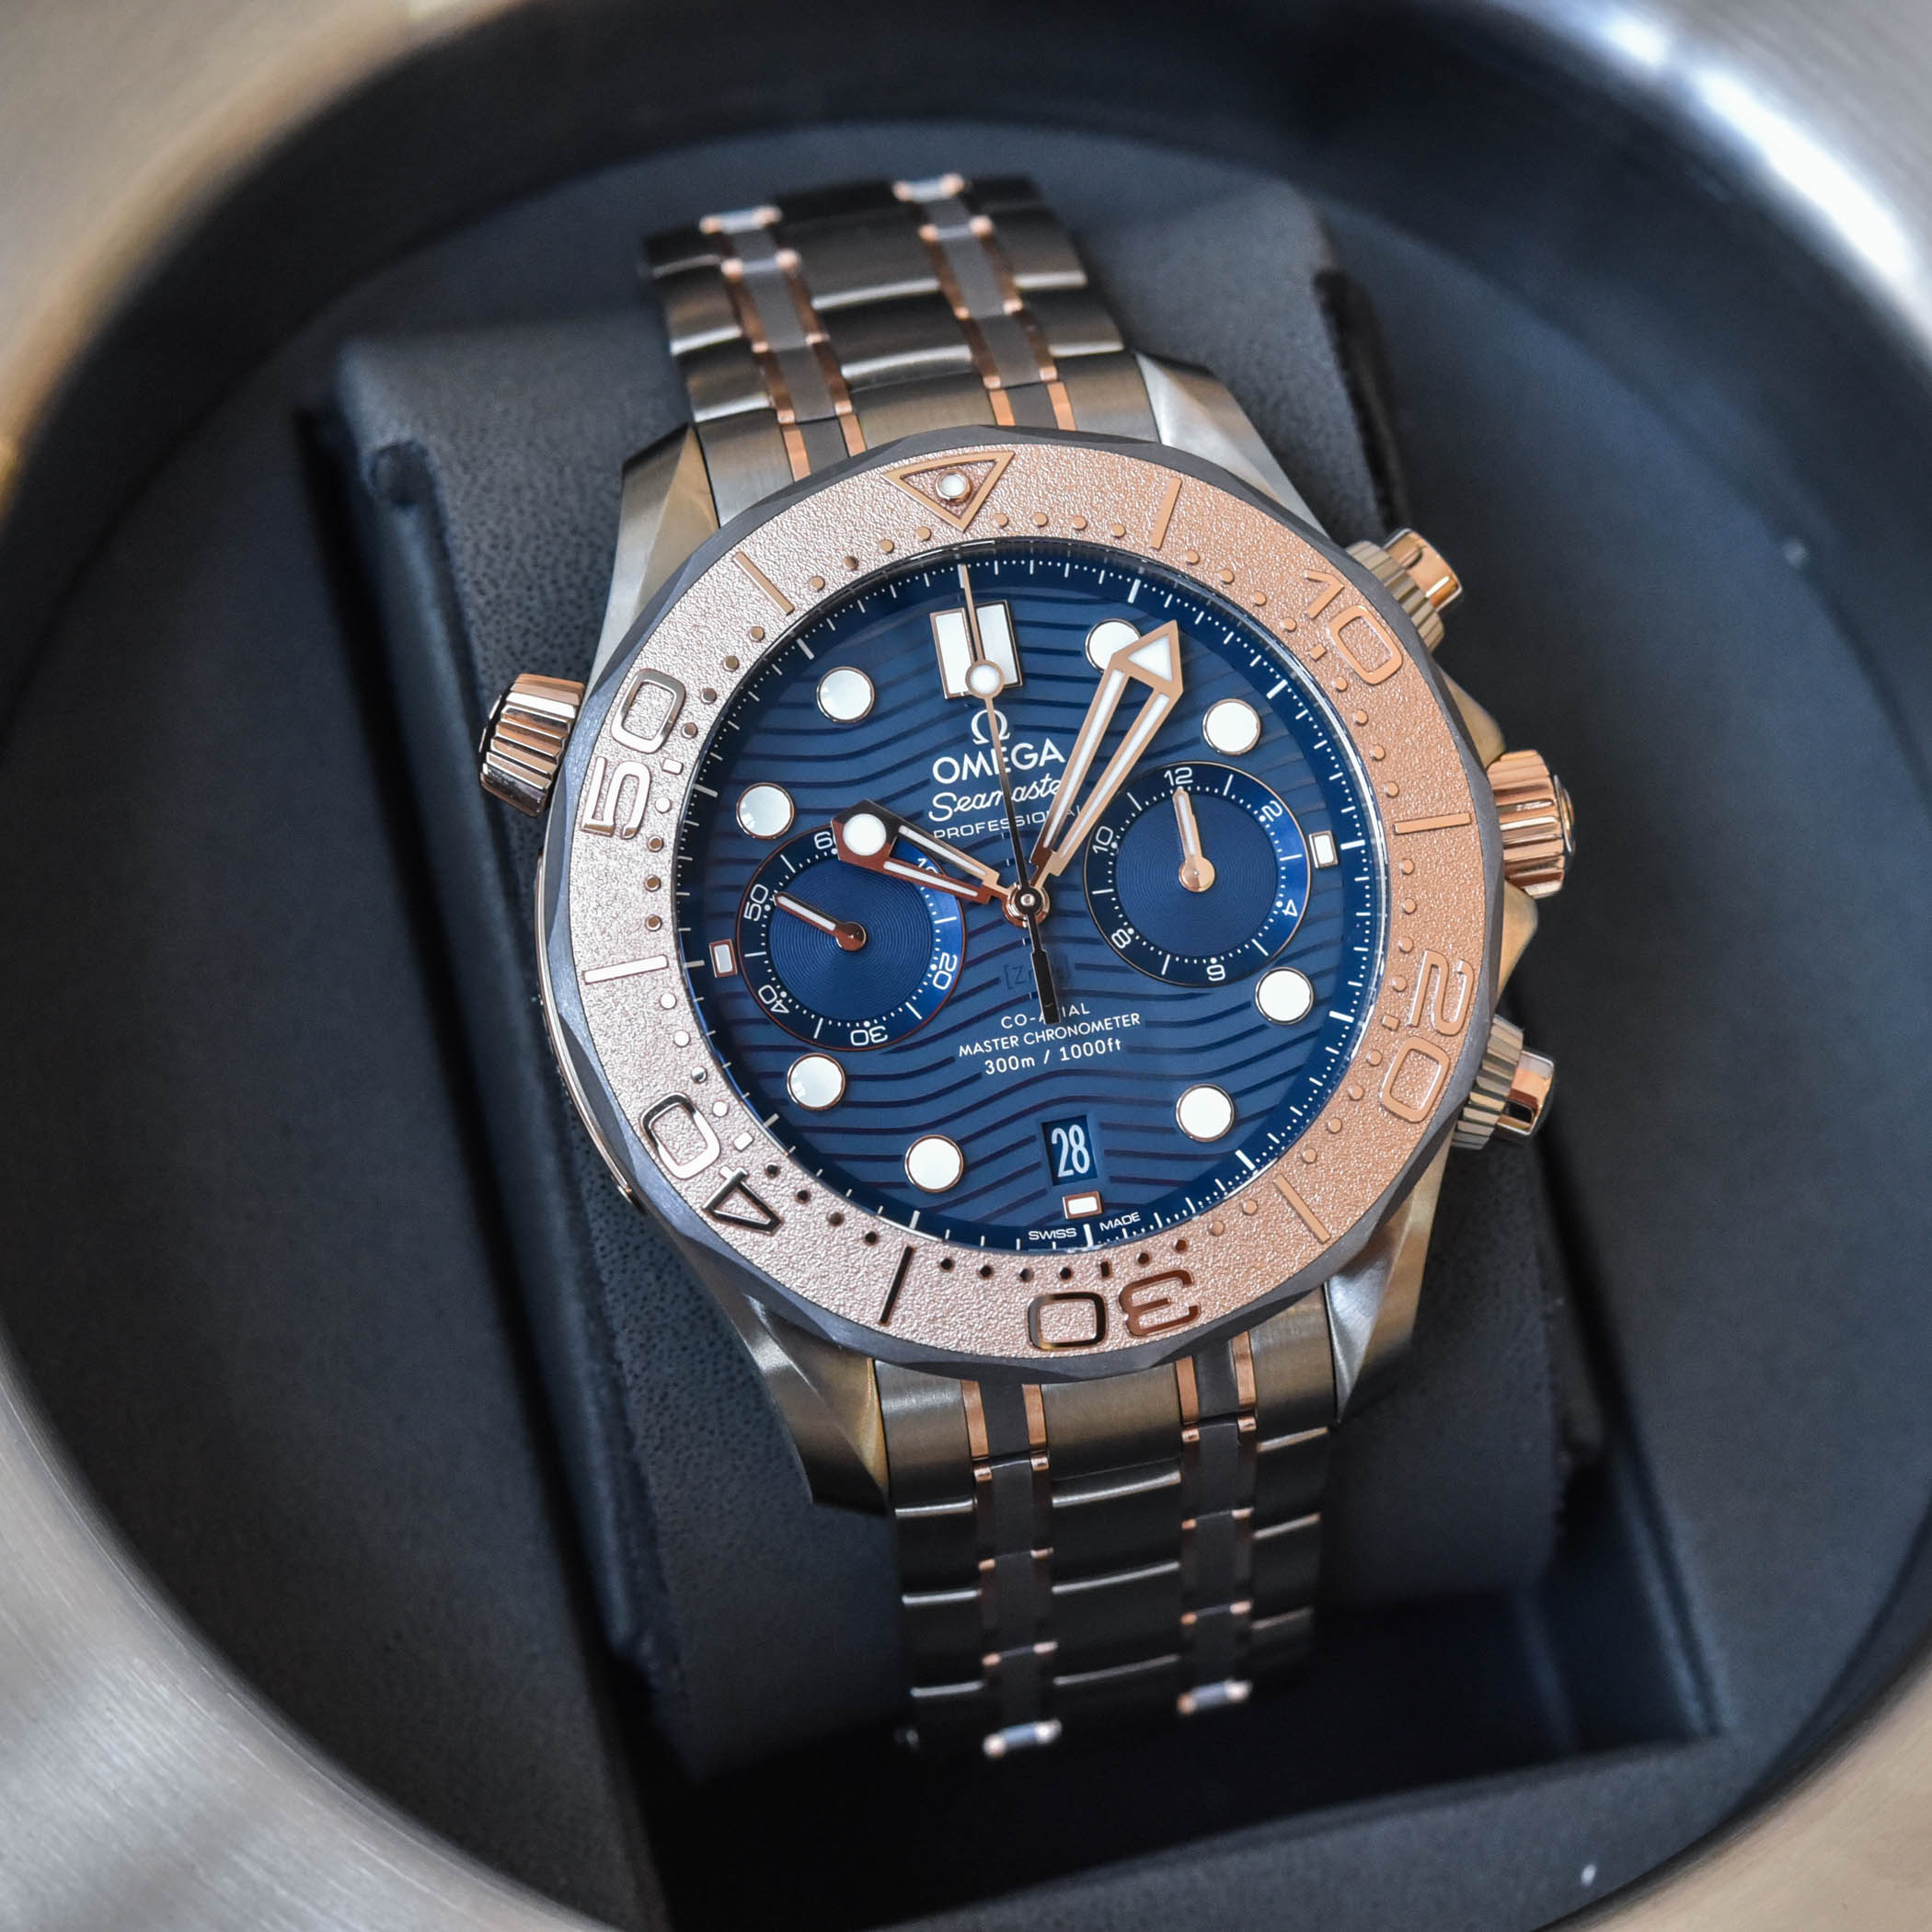 Omega Seamaster Diver 300M Chronograph tri-metal Titanium Tantalum Gold - 2